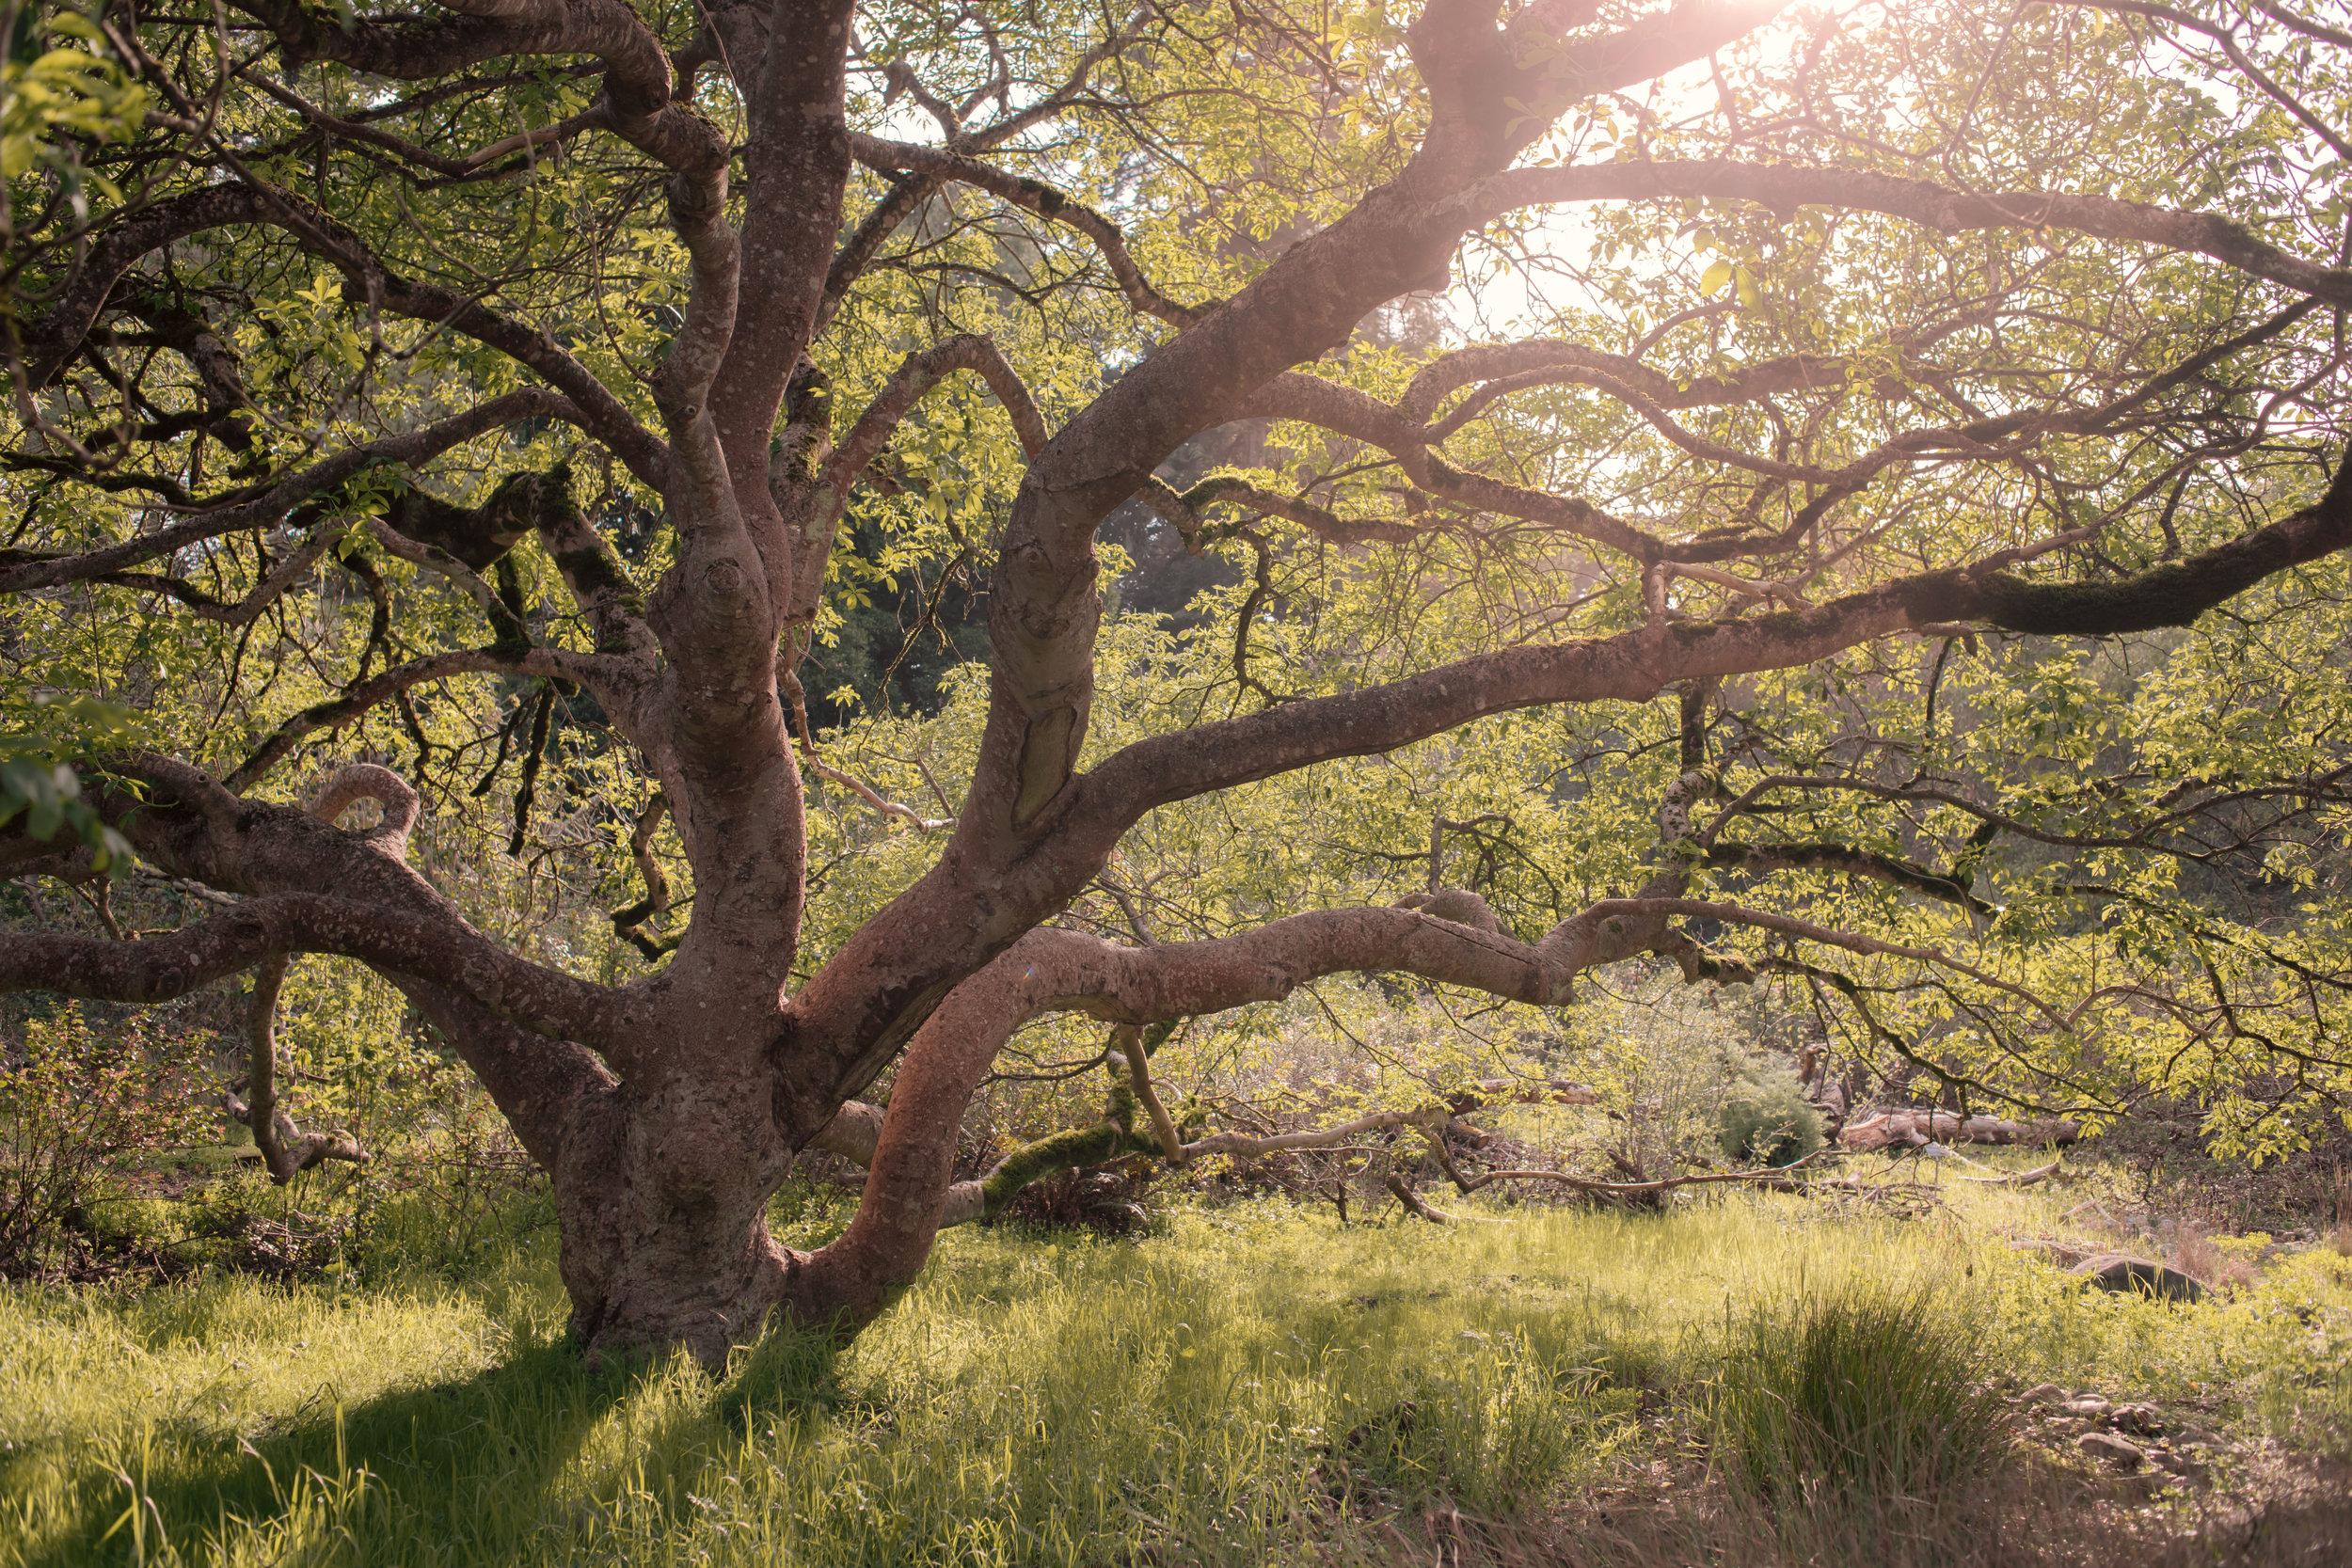 9553 tree (1 of 1).jpg